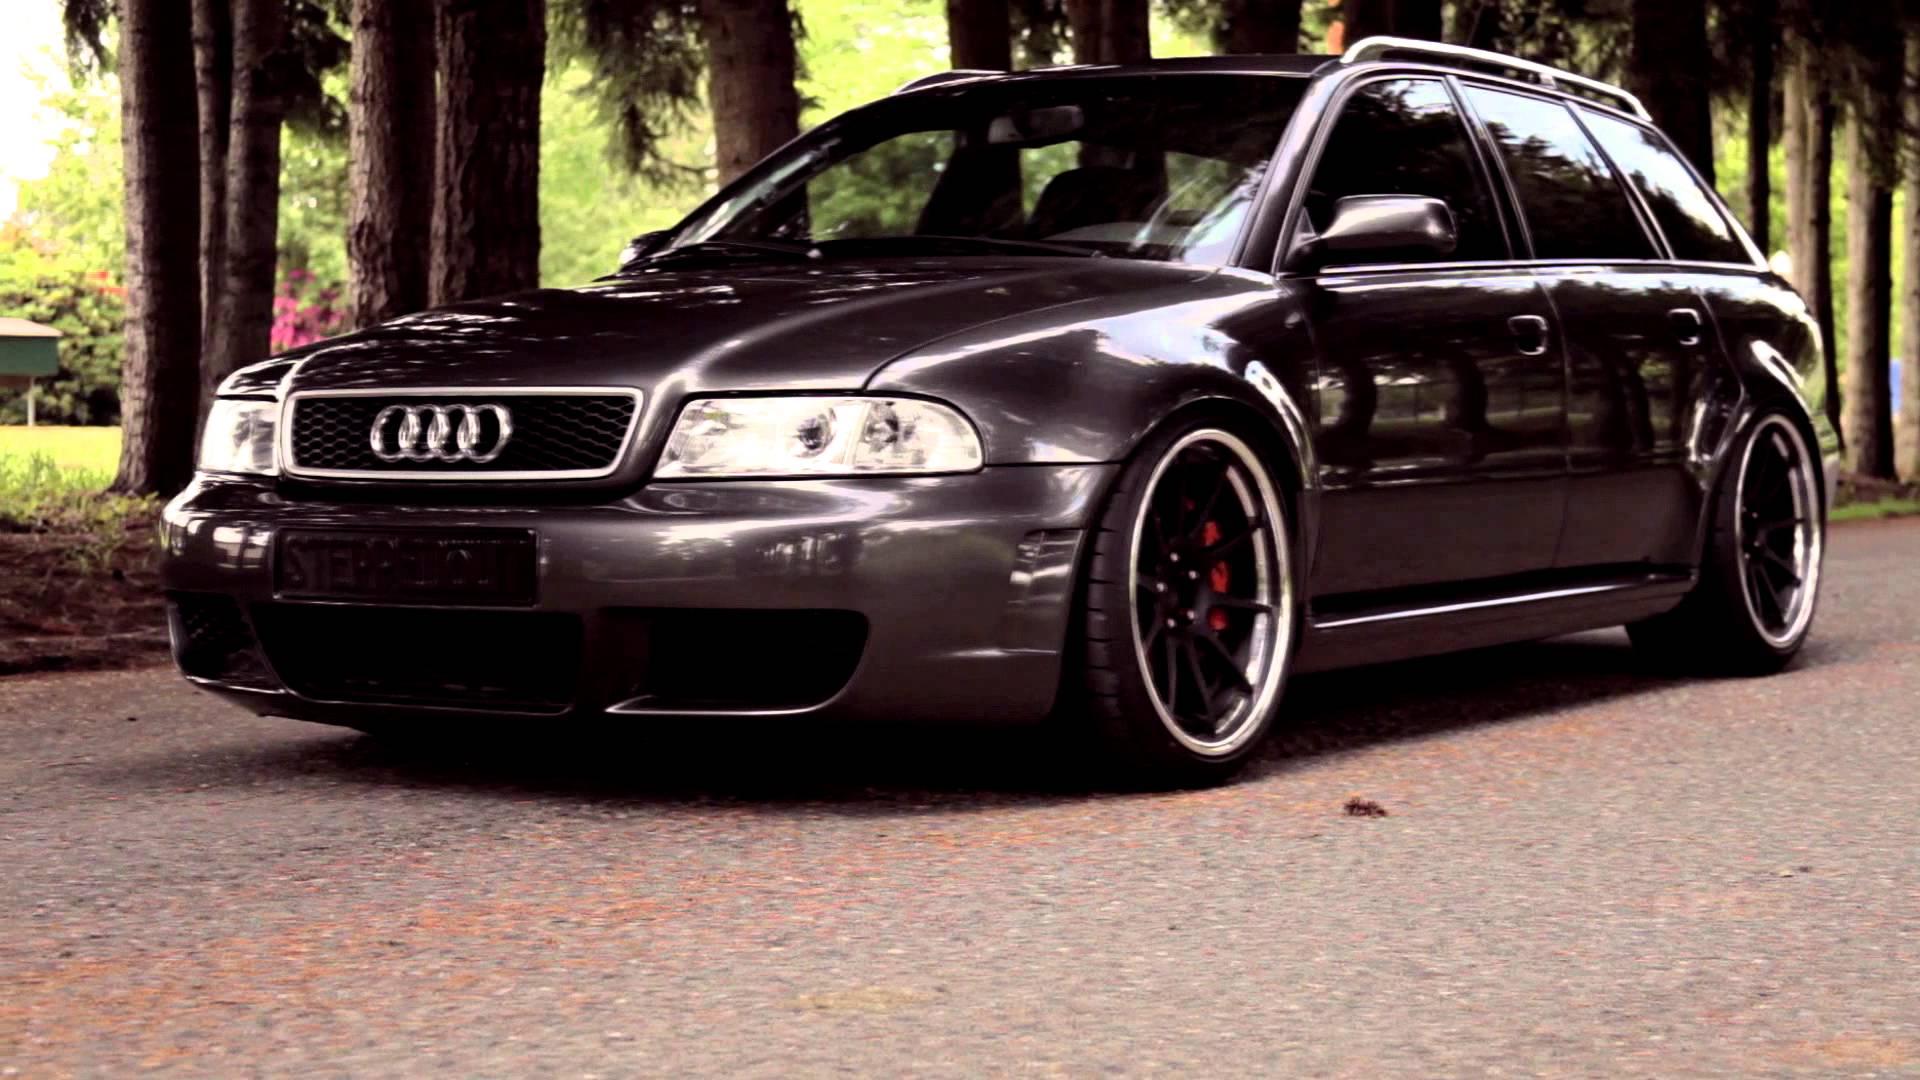 Audi-S4-B5-2